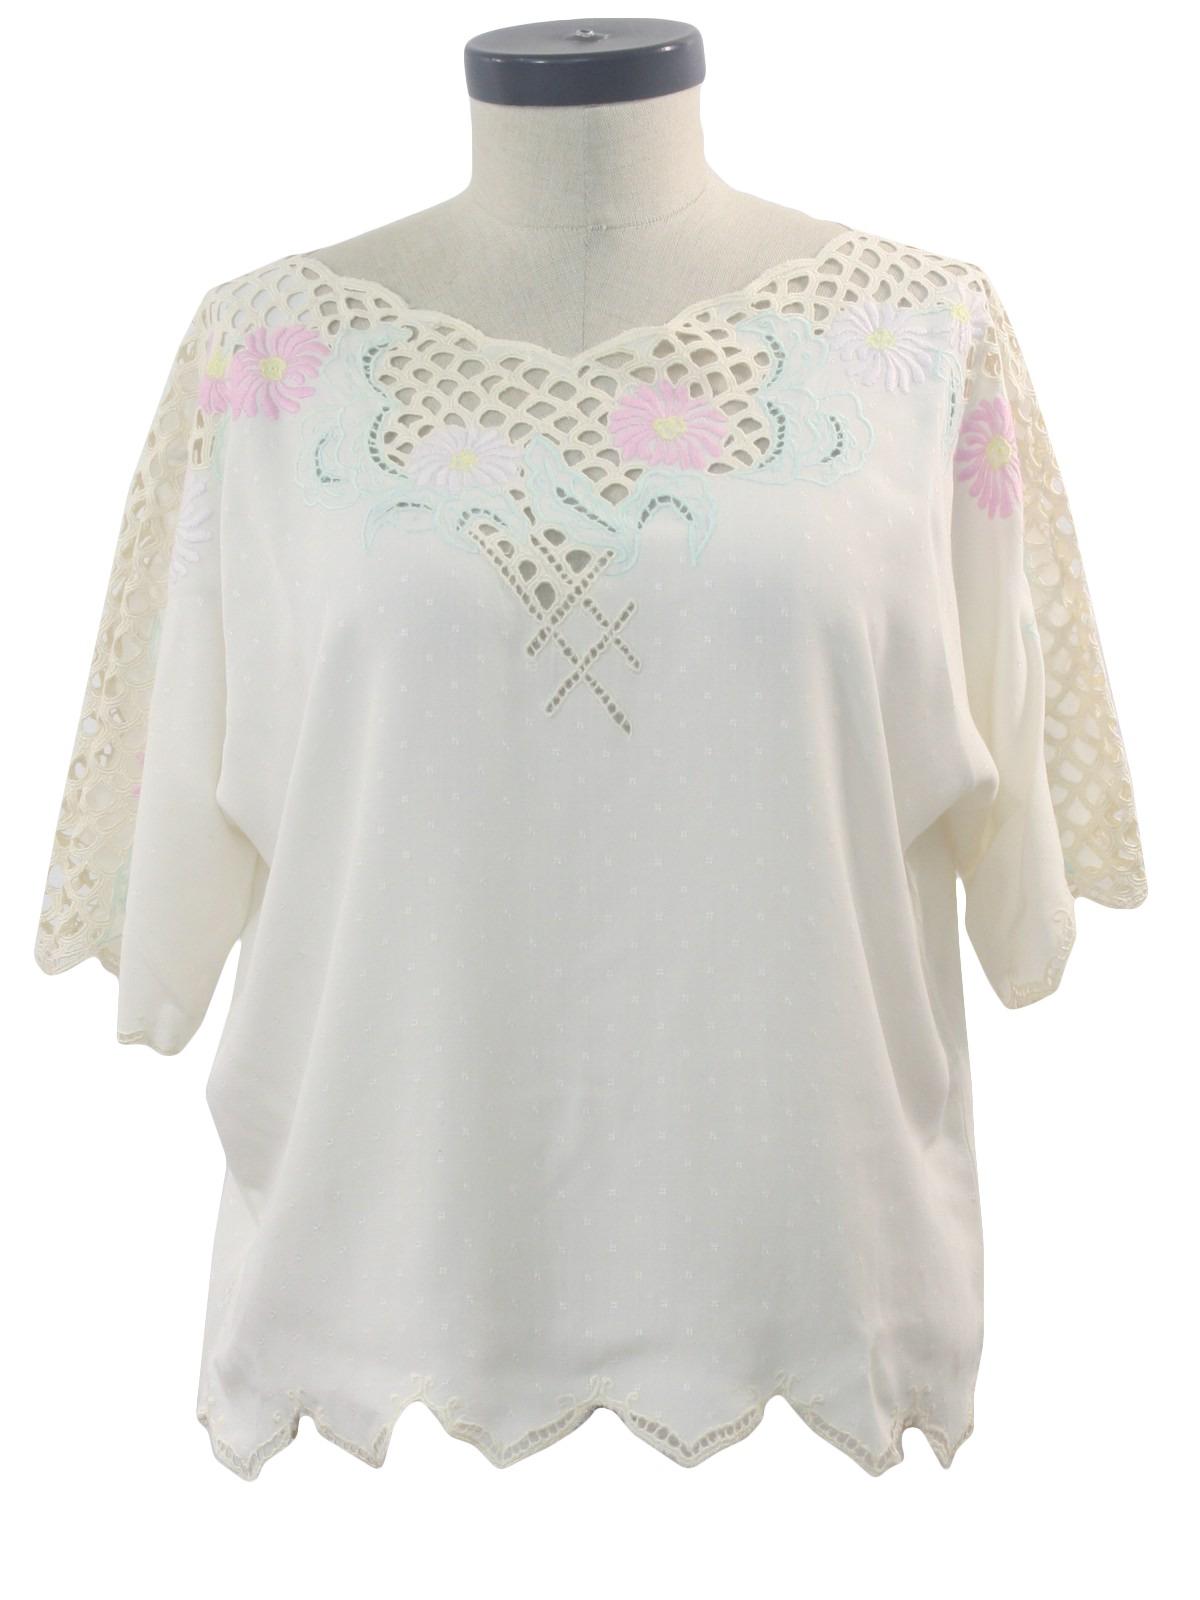 Retro s hippie shirt bali emerald design